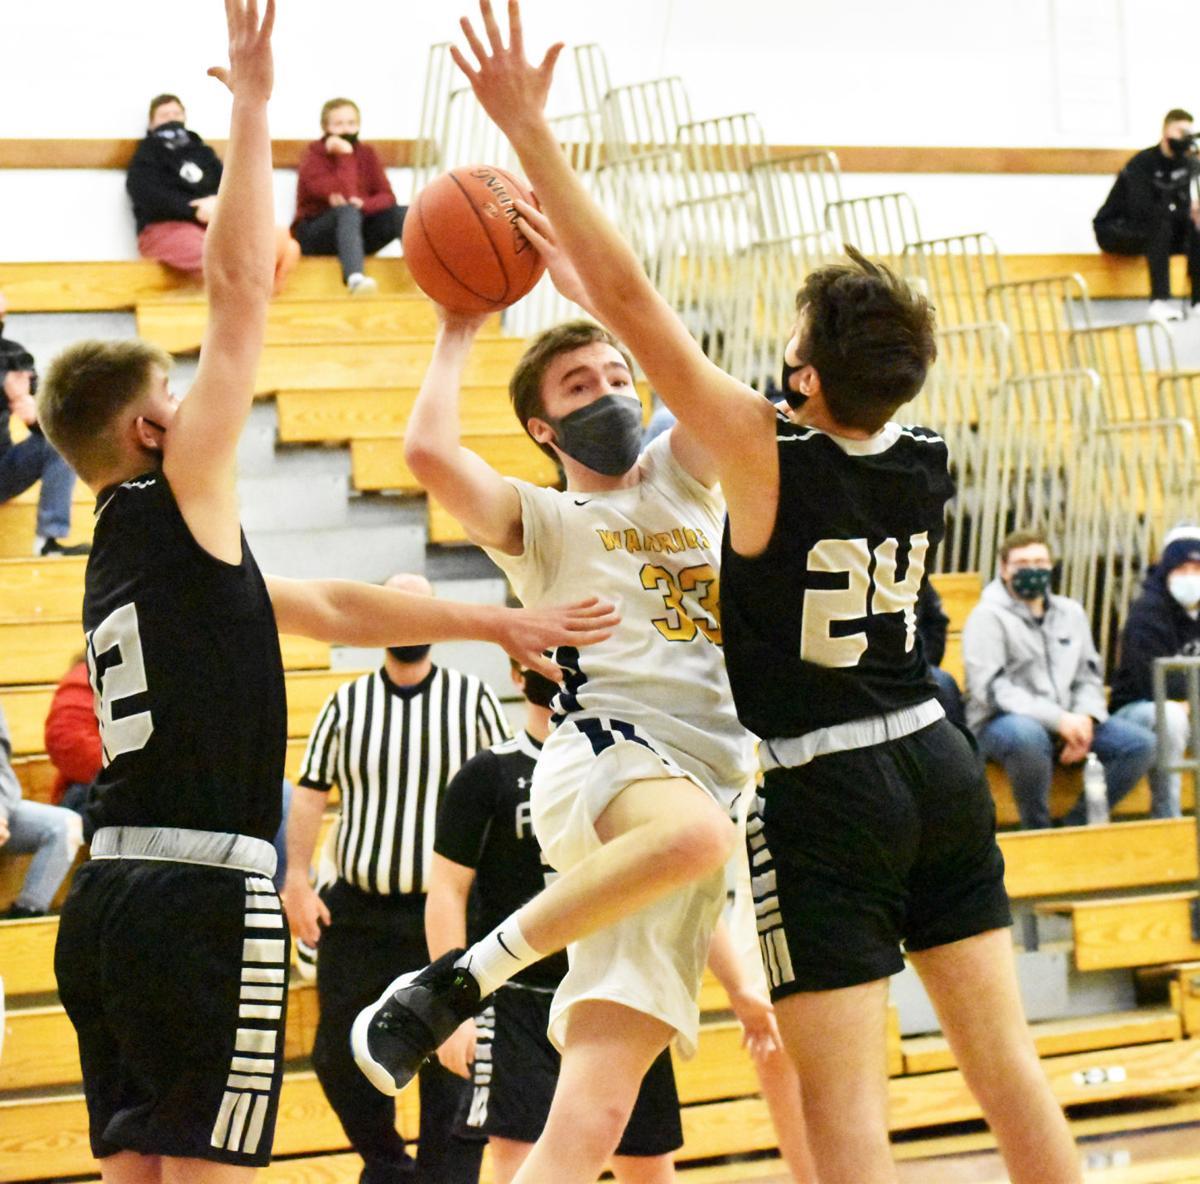 Everett goes up between defenders